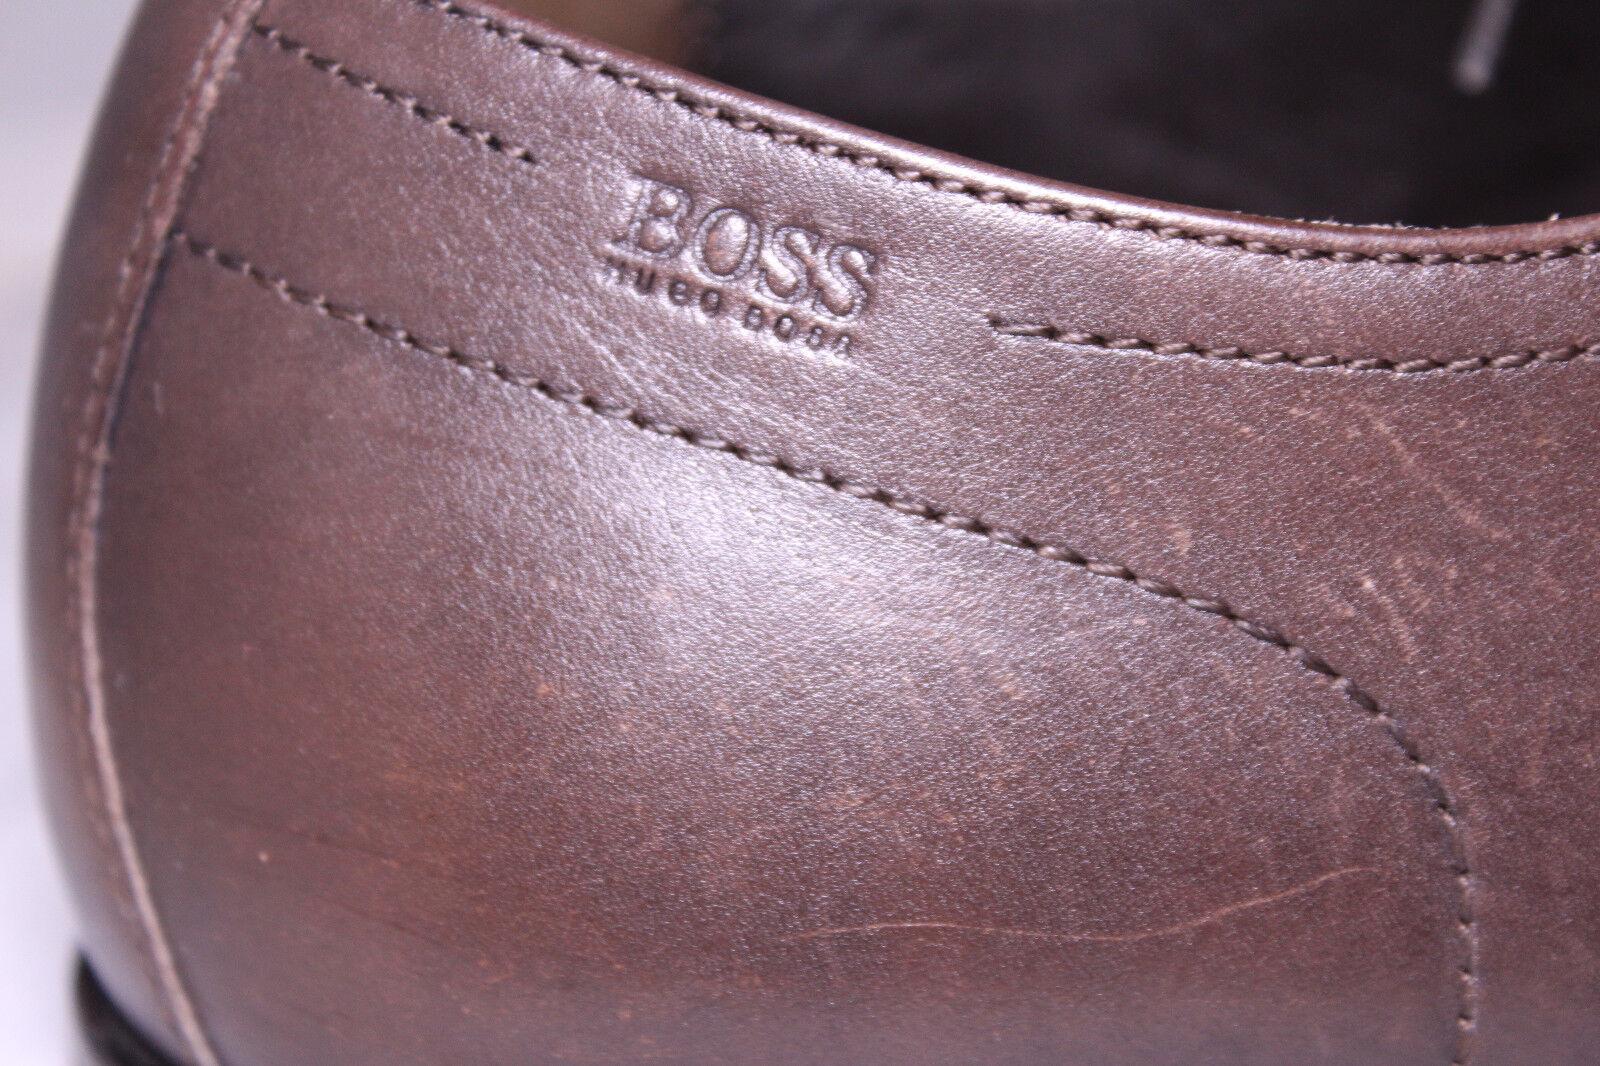 Hugo Boss Boss Boss Men braun Laced Romes Vero Cuoio Leather Oxford Dress schuhe Sz 12  245 fe2614